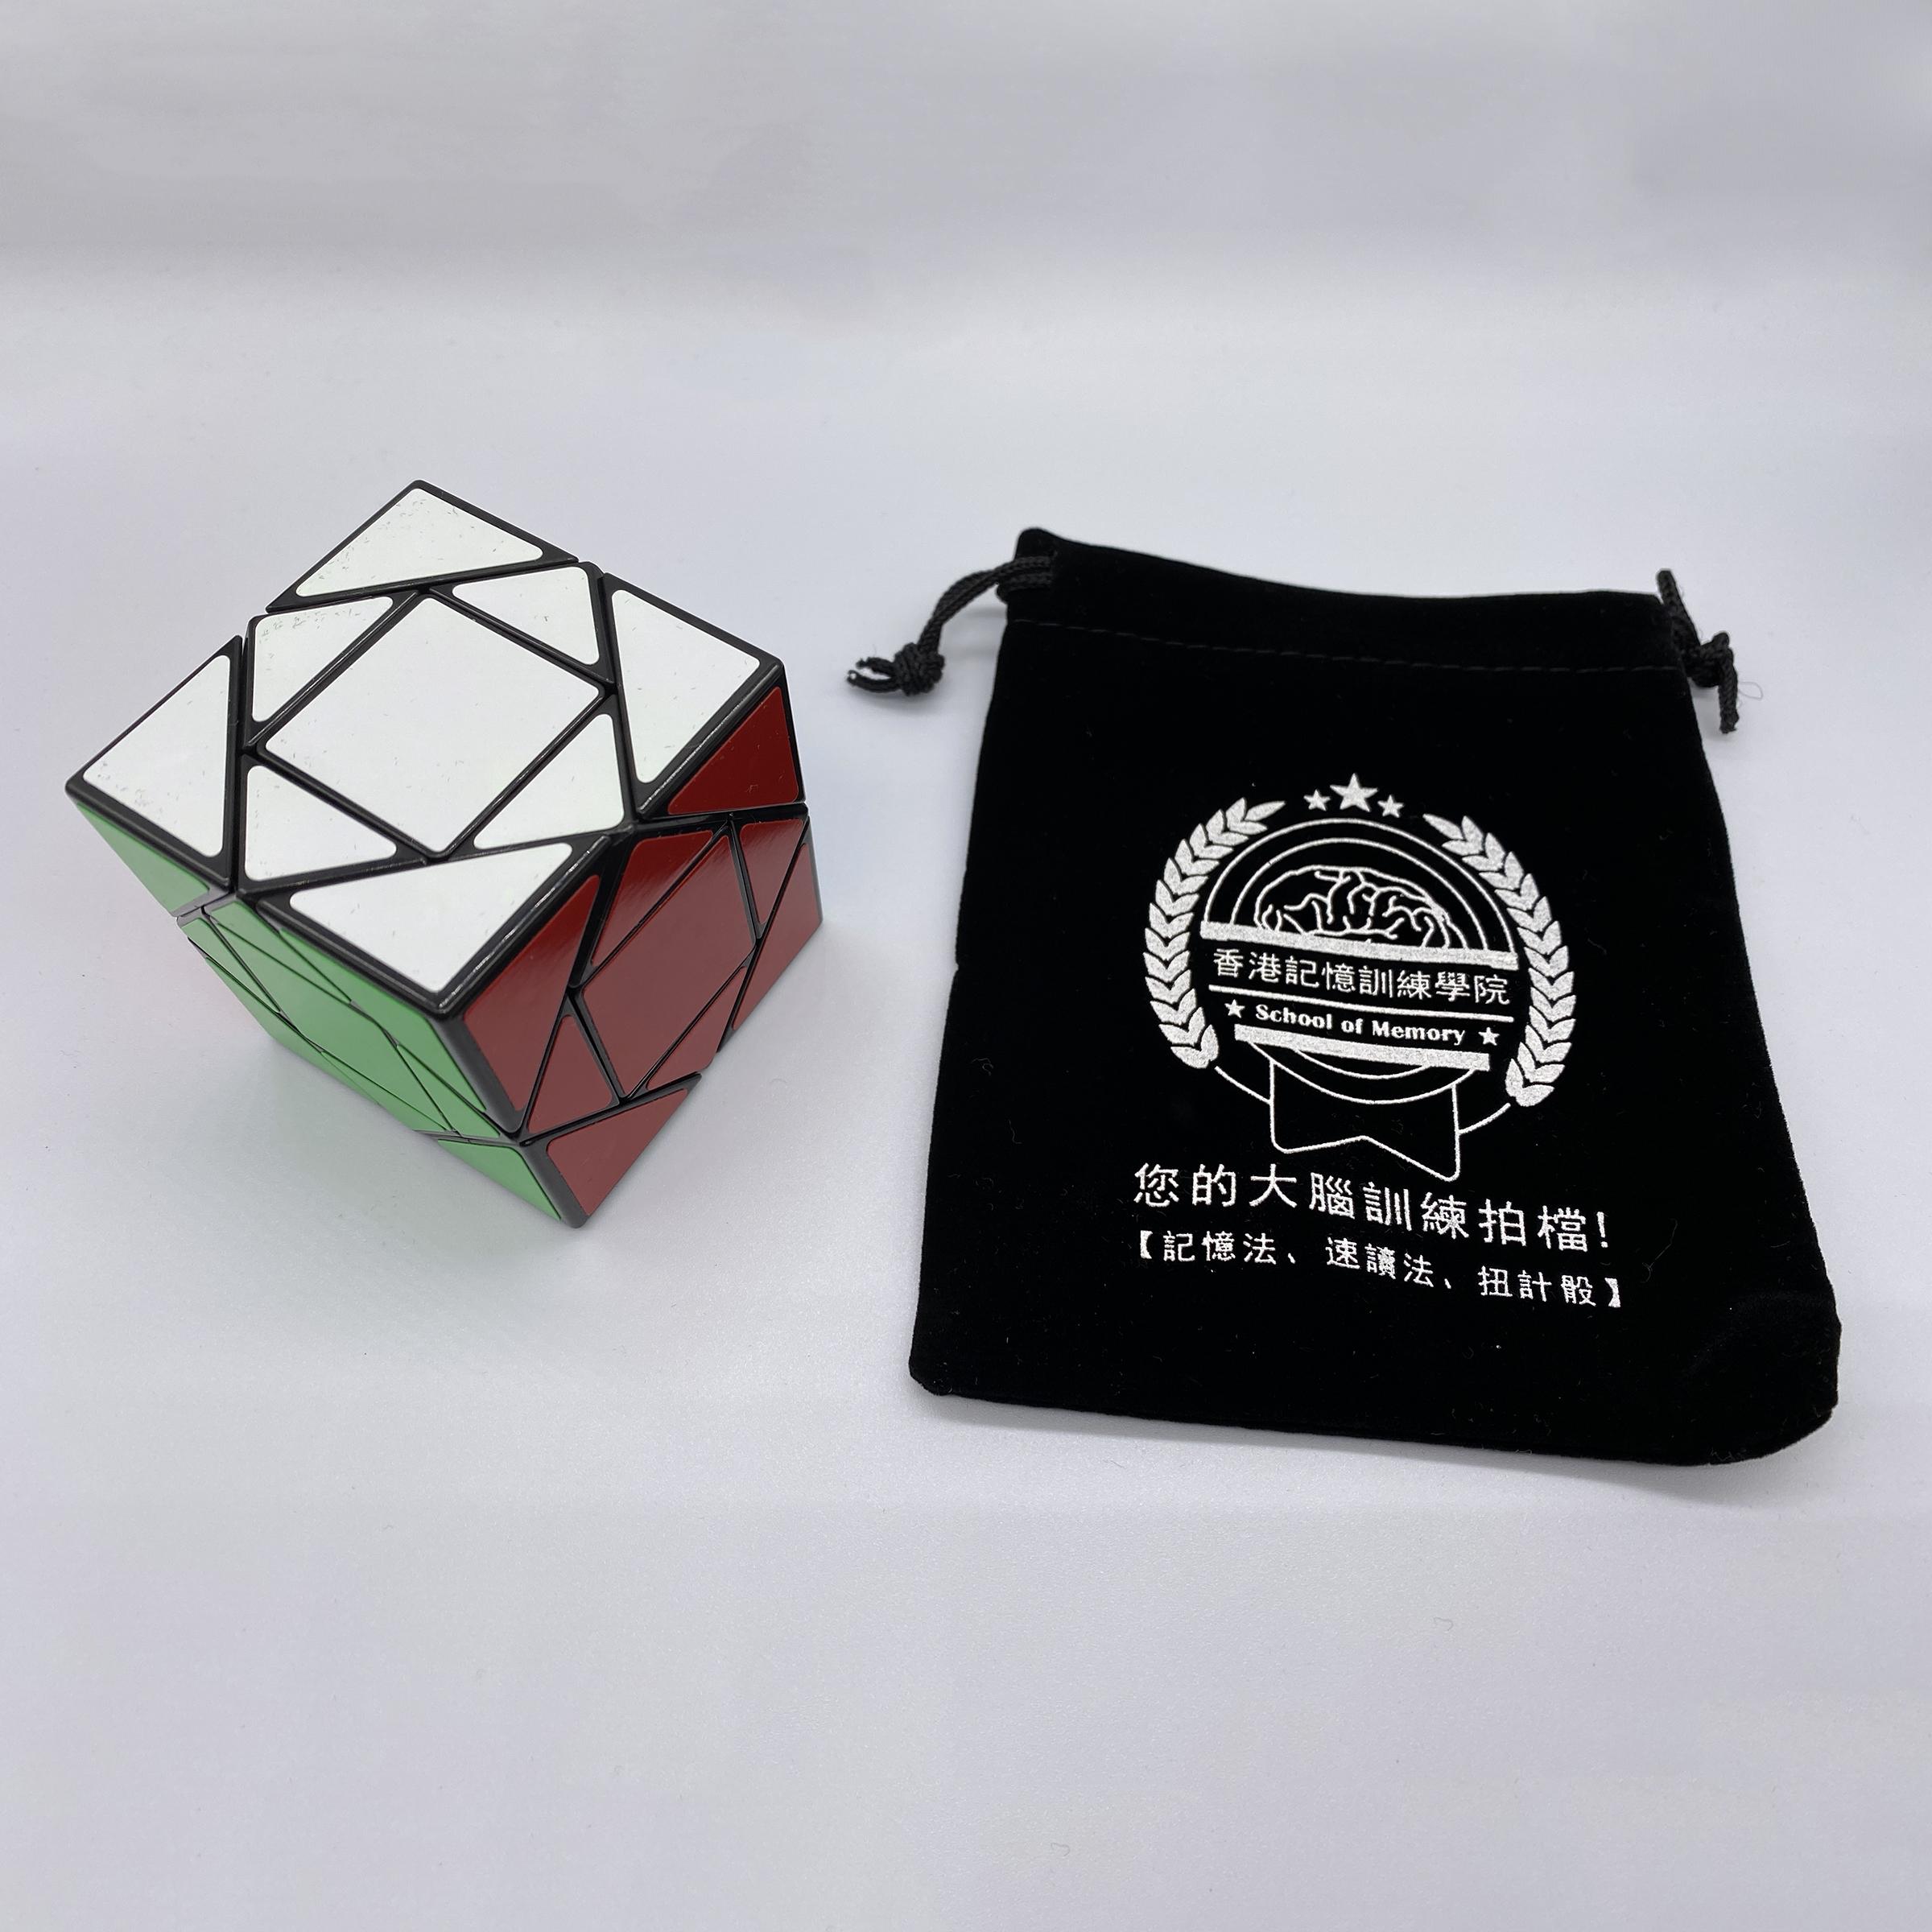 Moyu Pandora Cube 魔域潘多拉扭計骰